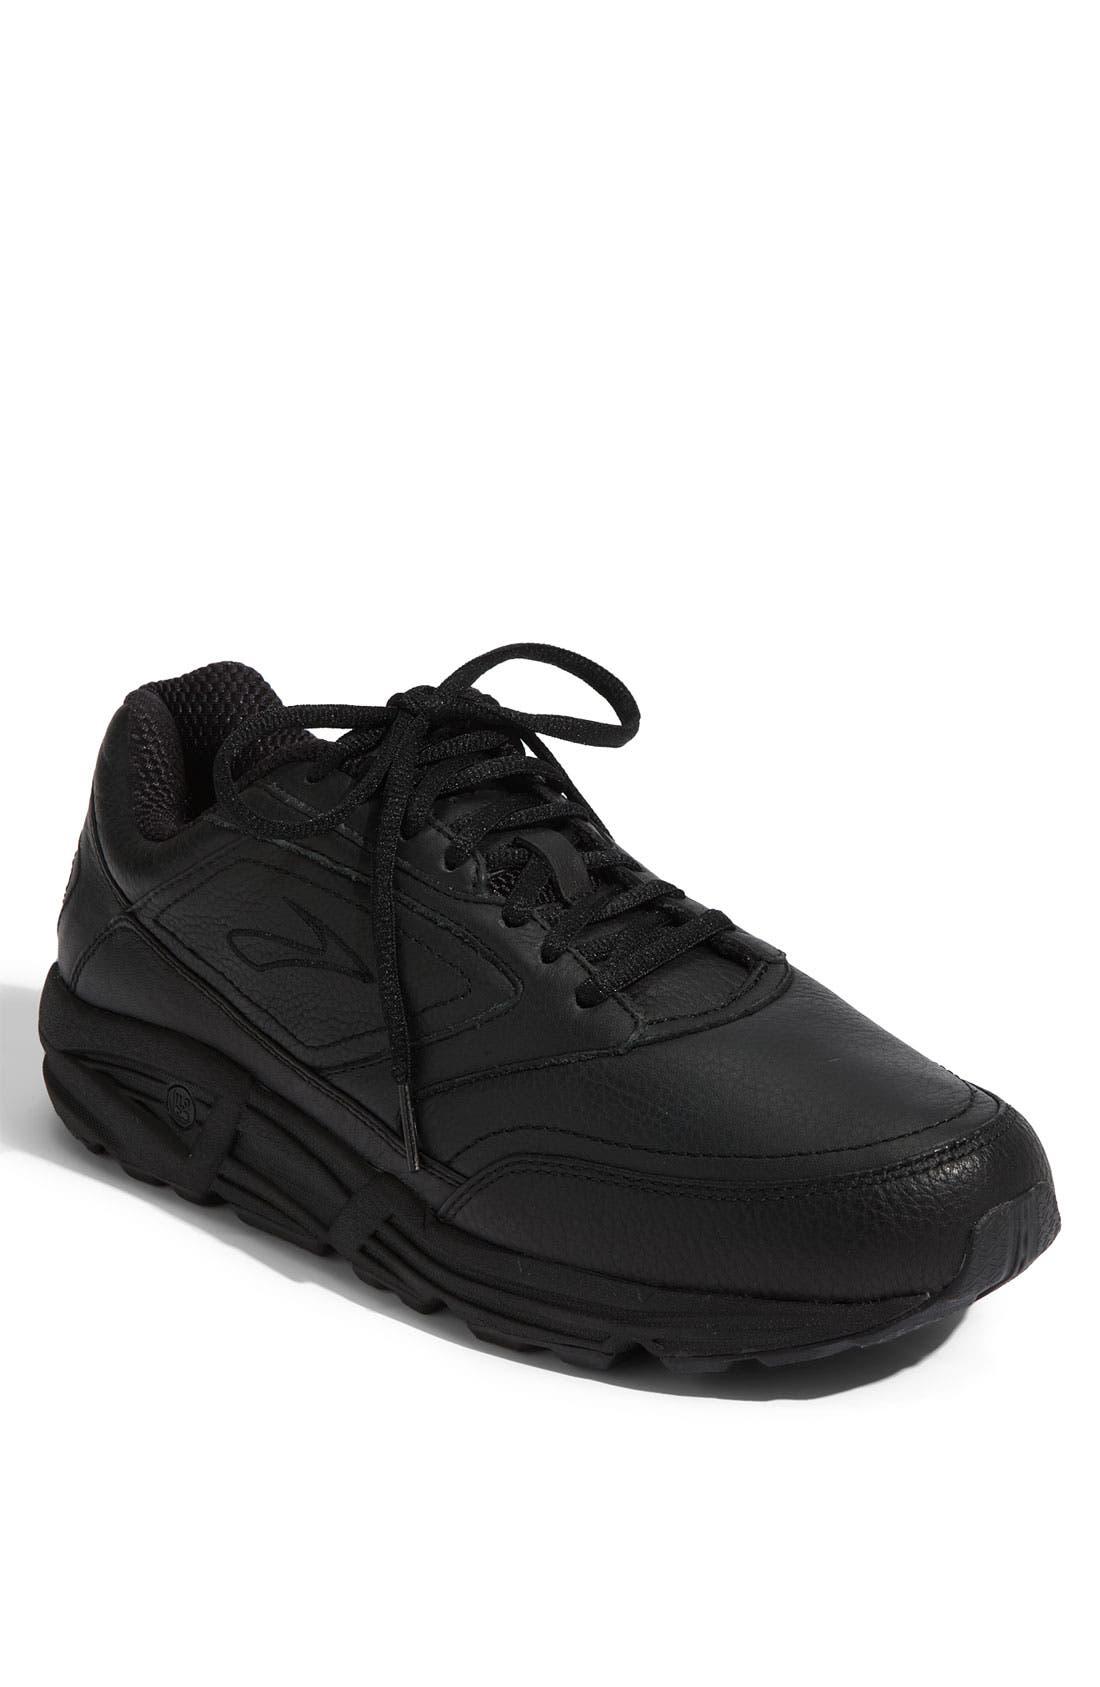 BROOKS 'Addiction' Walking Shoe, Main, color, BLACK